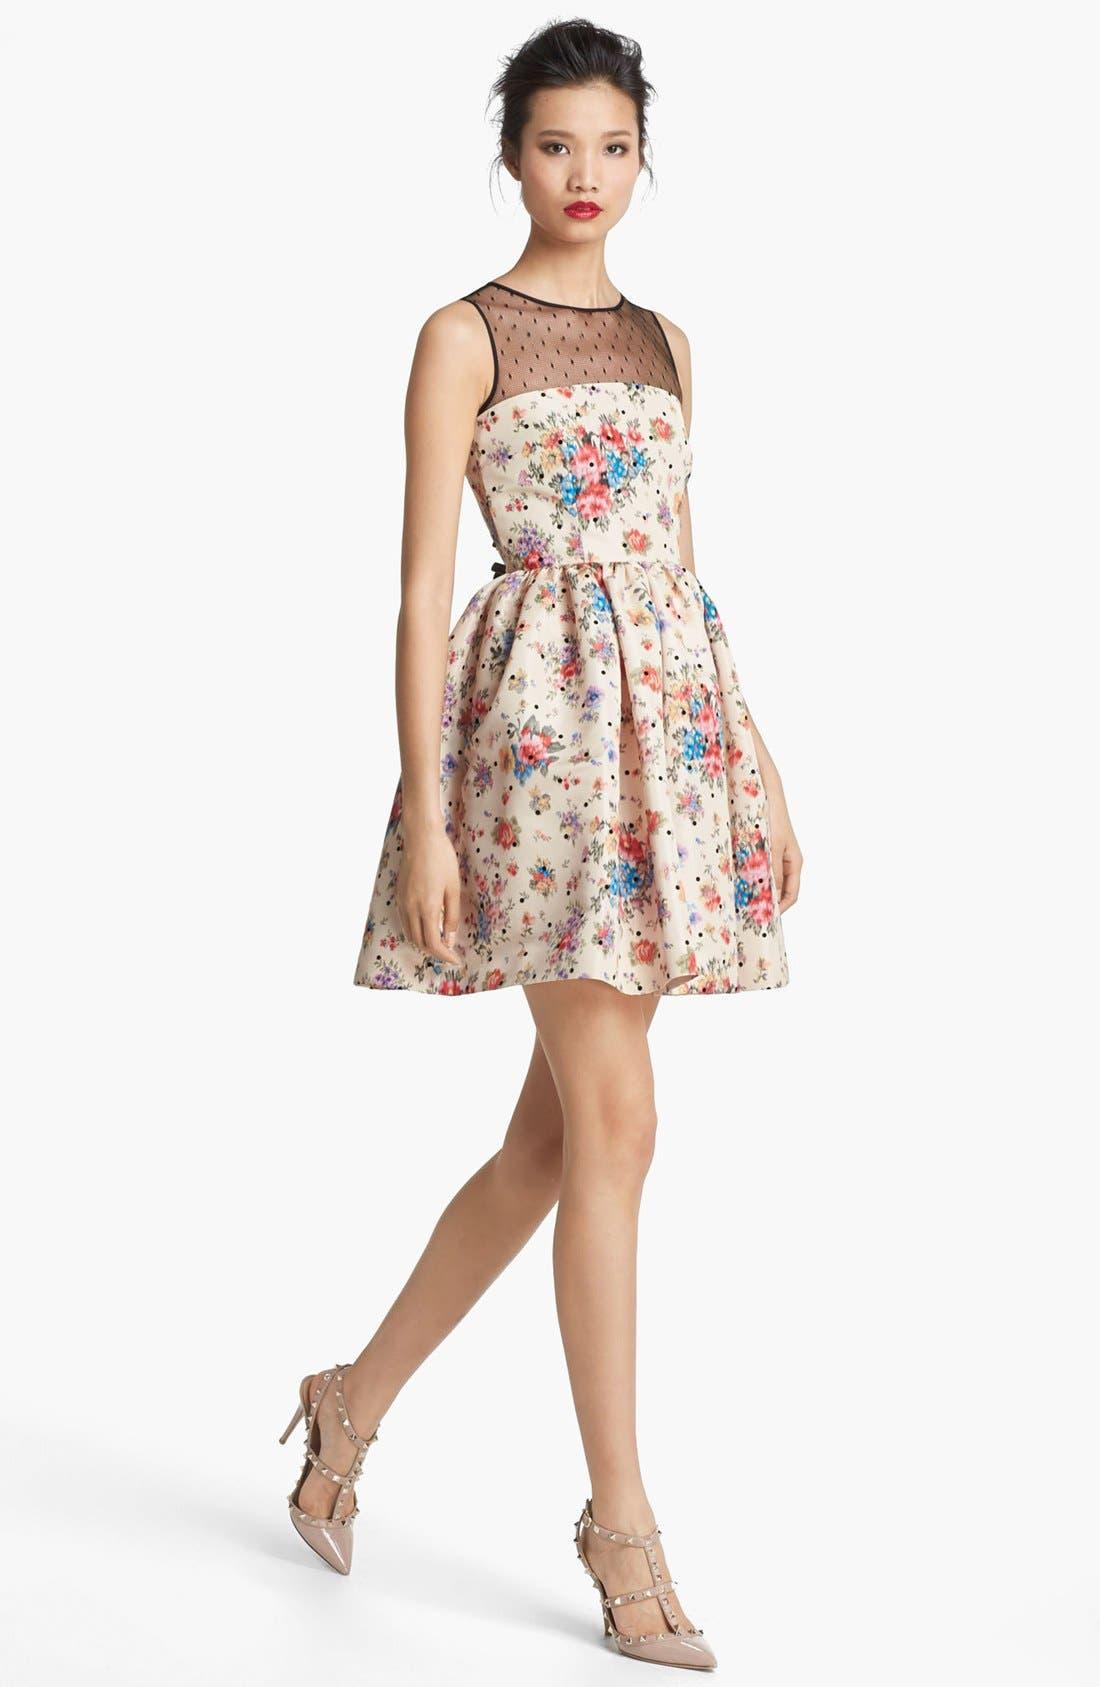 Main Image - RED Valentino Flower & Polka Dot Print Dress